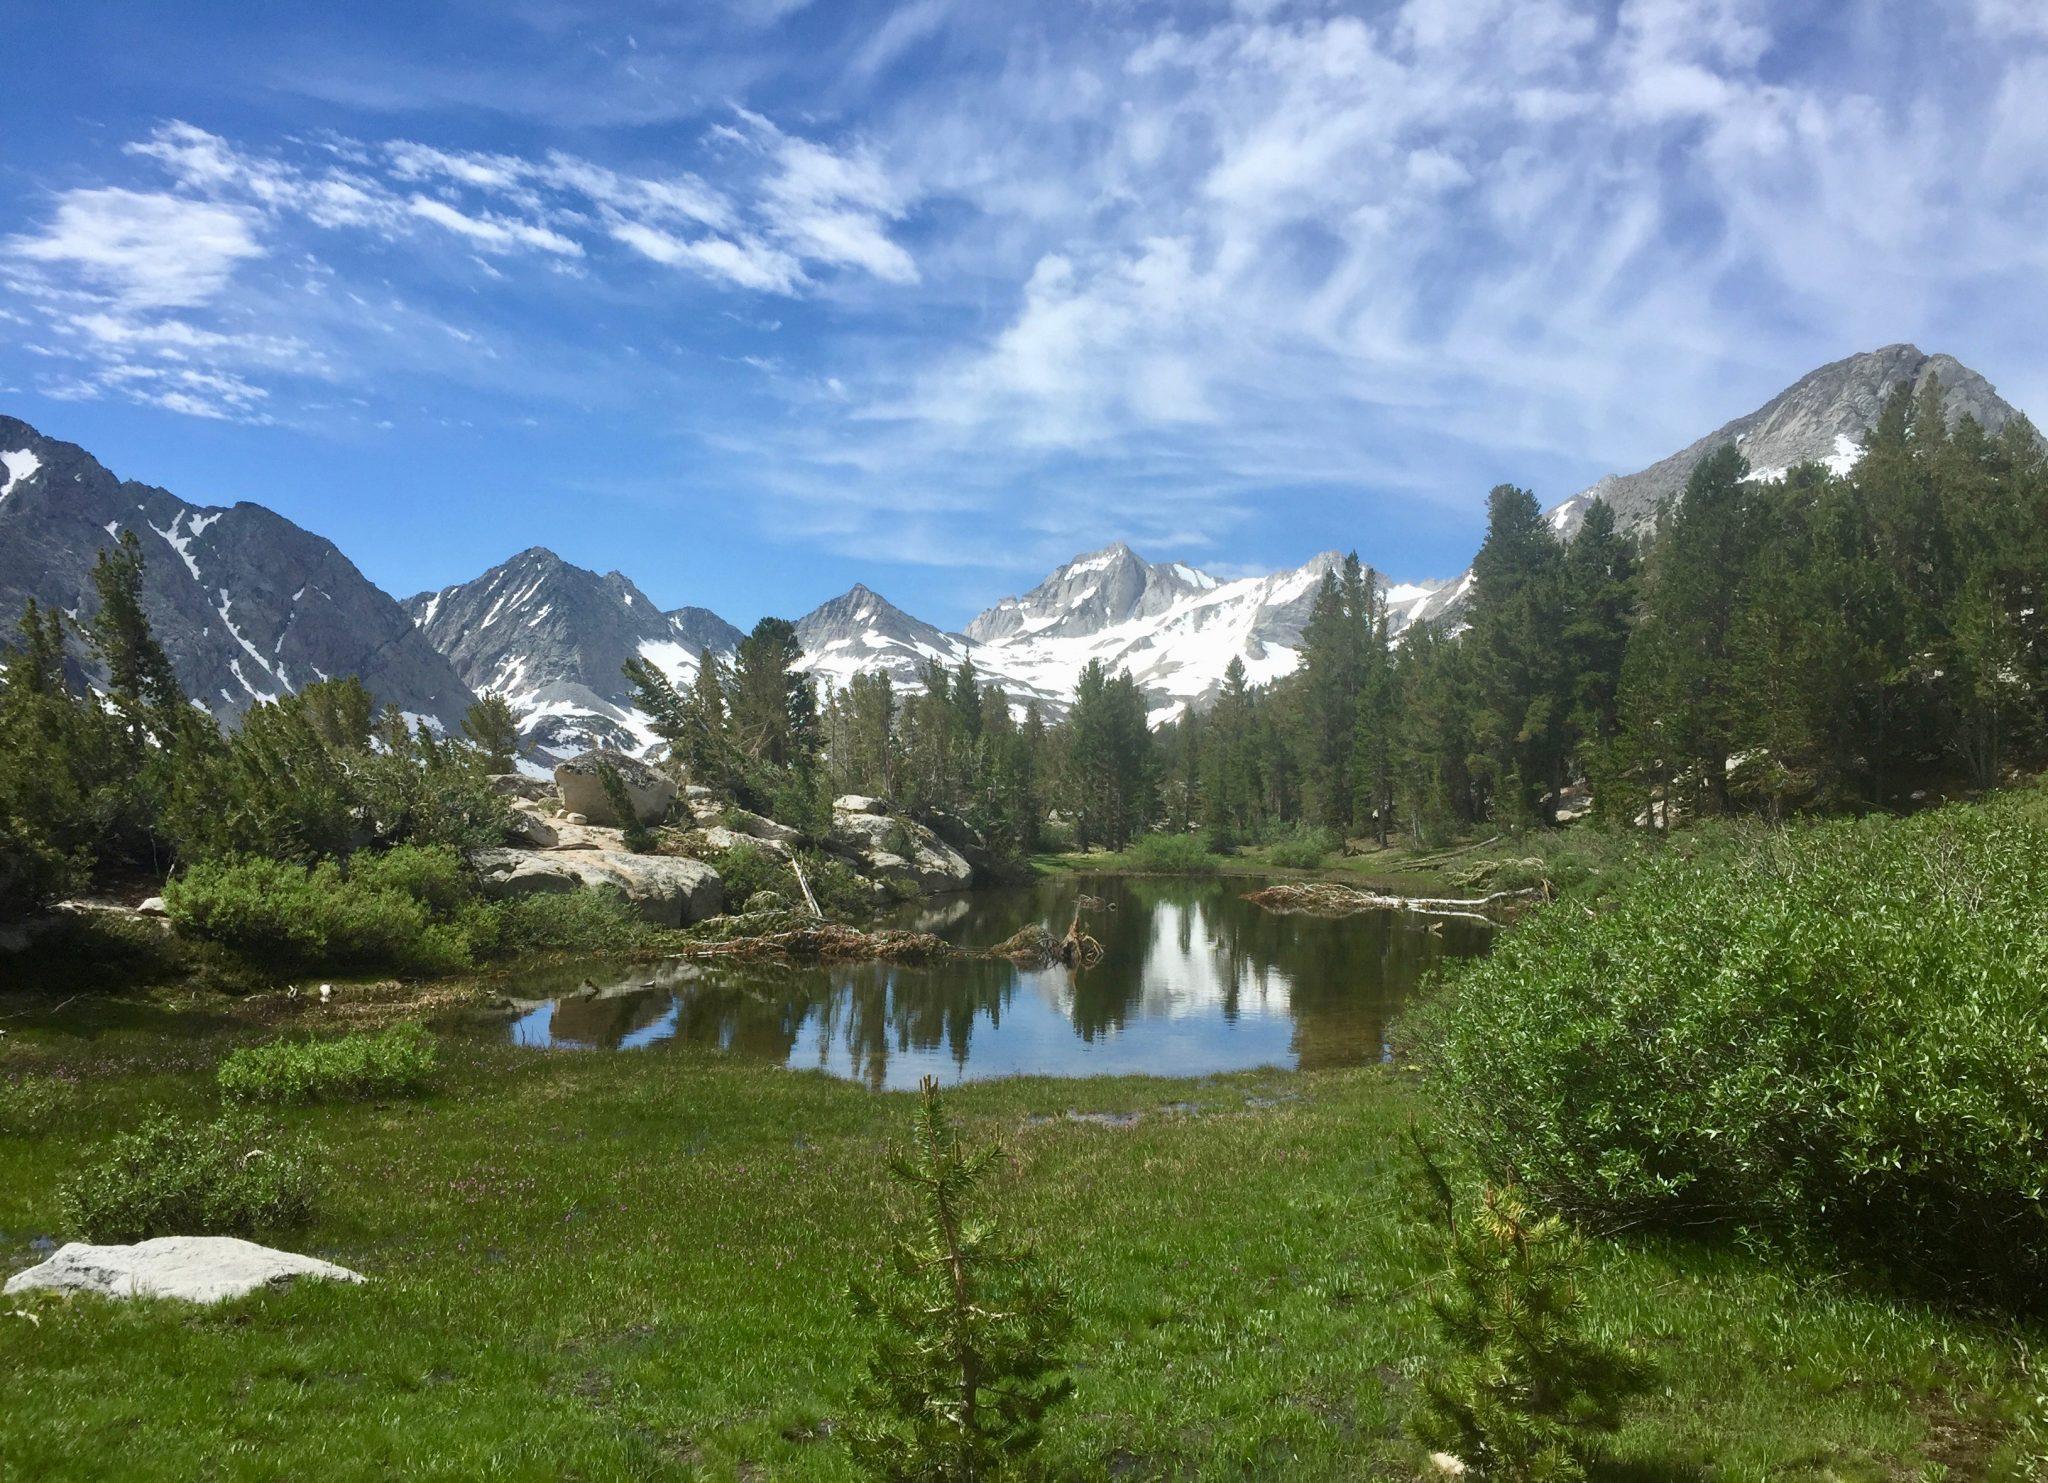 alpine meadow with snowy peaks sierra nevada